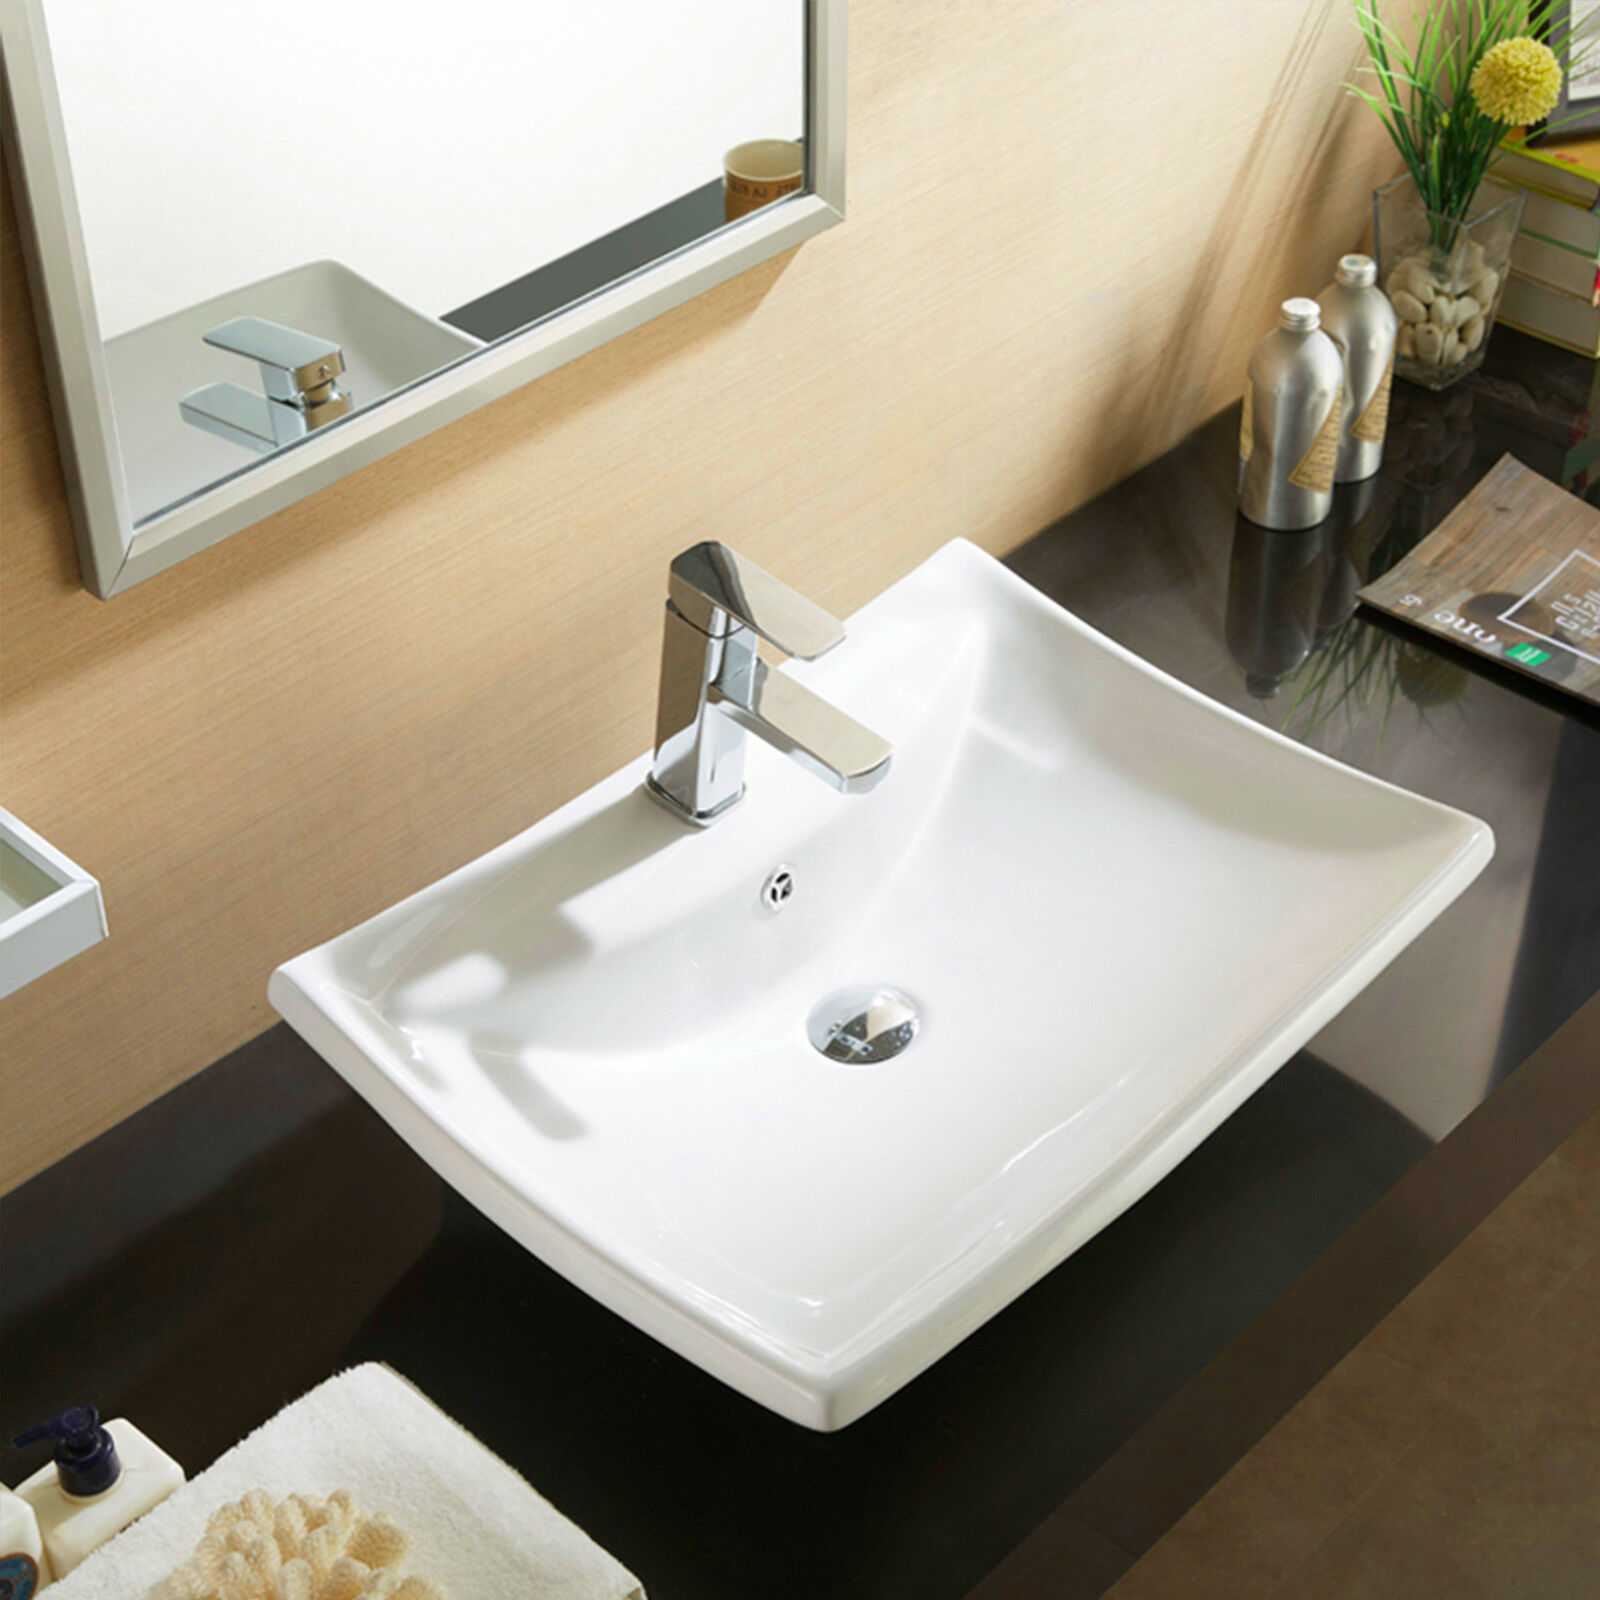 Modern Corner Ceramic Cloakroom Wash Basin Wall Hung Bathroom Sink /& Waste Plug